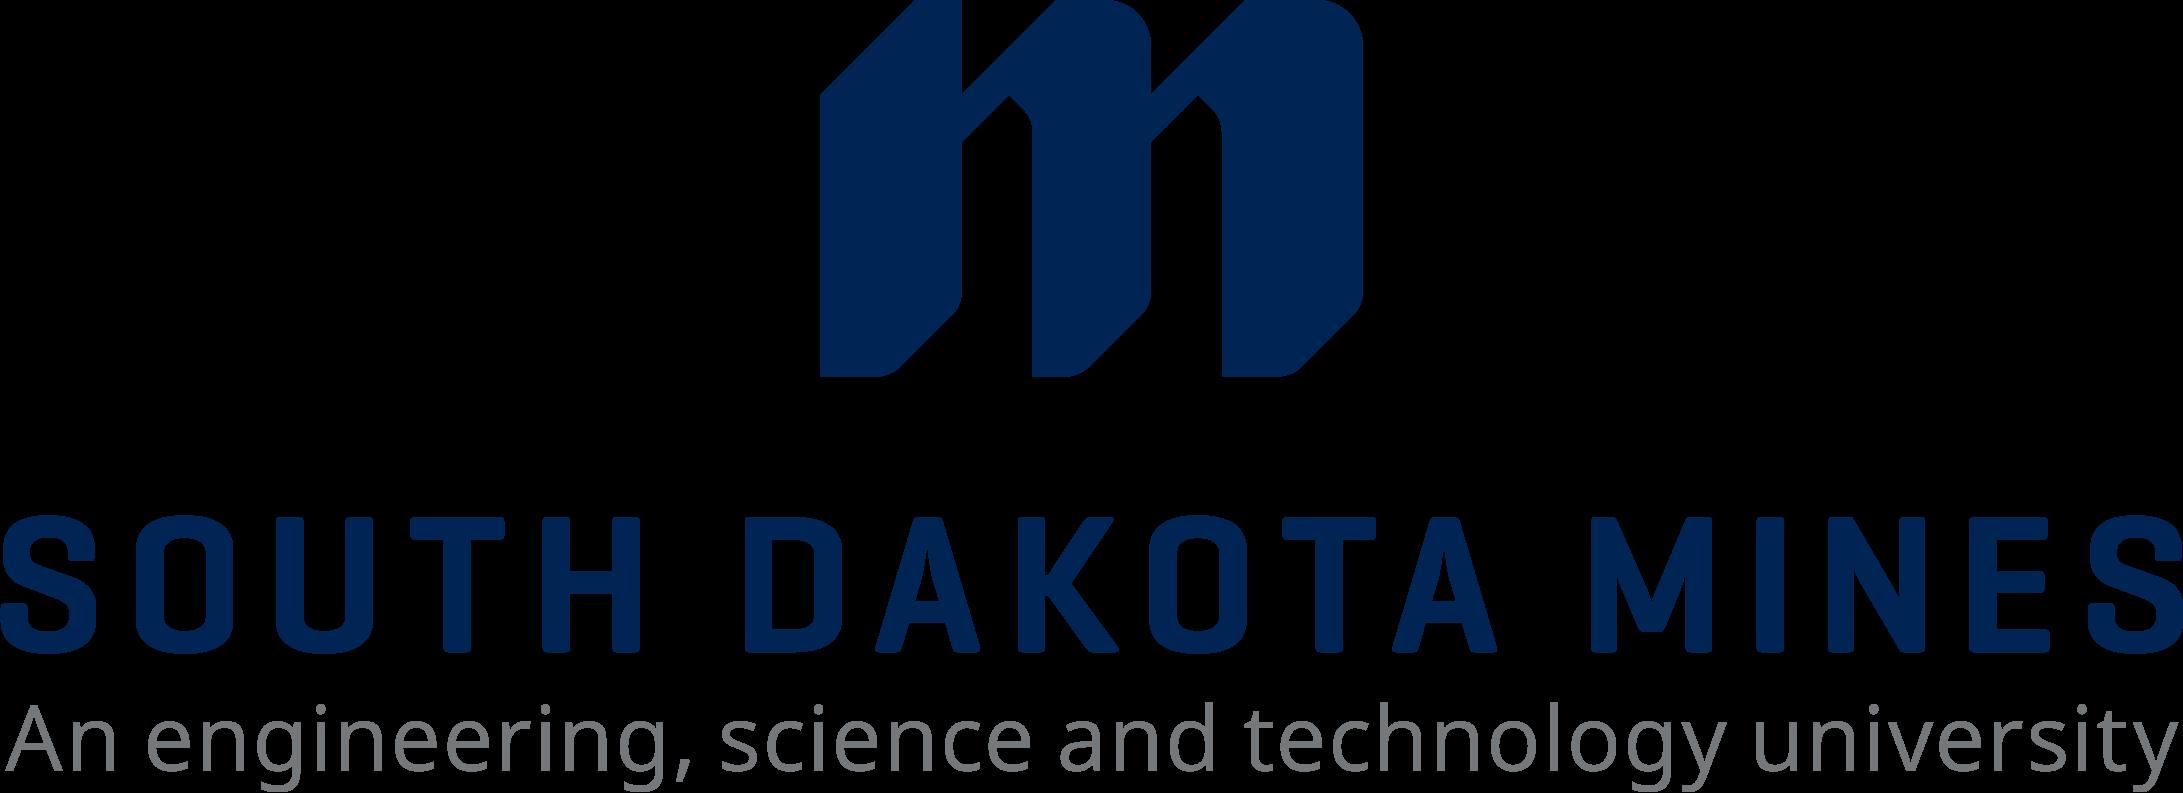 South Dakota Mines Logo